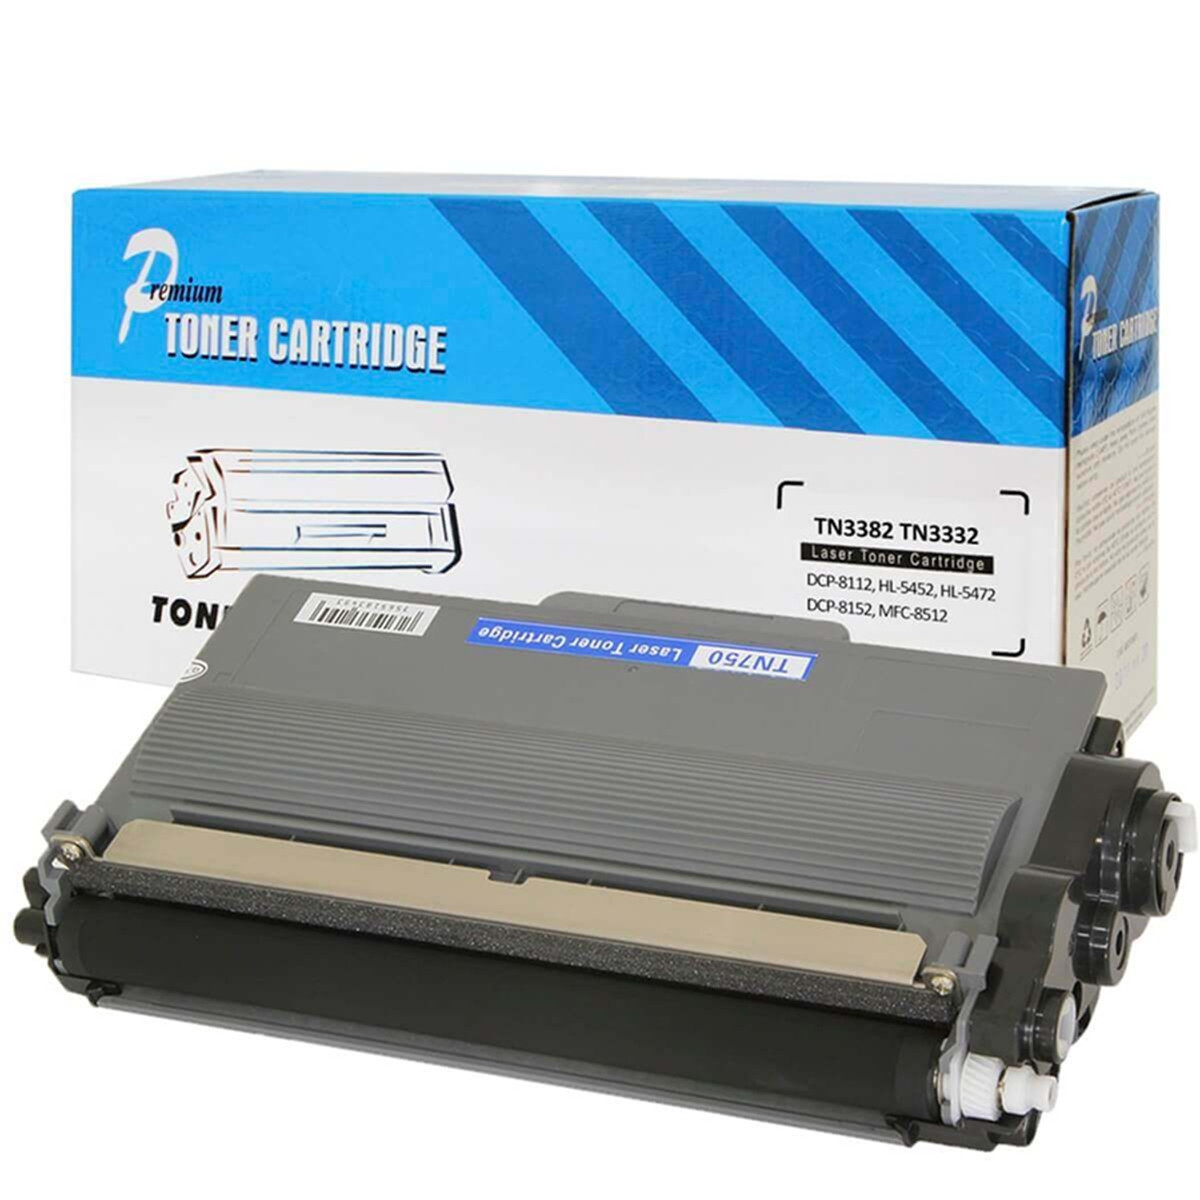 Toner Compatível com Brother TN3382   DCP-8112DN HL-5452DN DCP-8152DN MFC-8512DN   Premium 8k